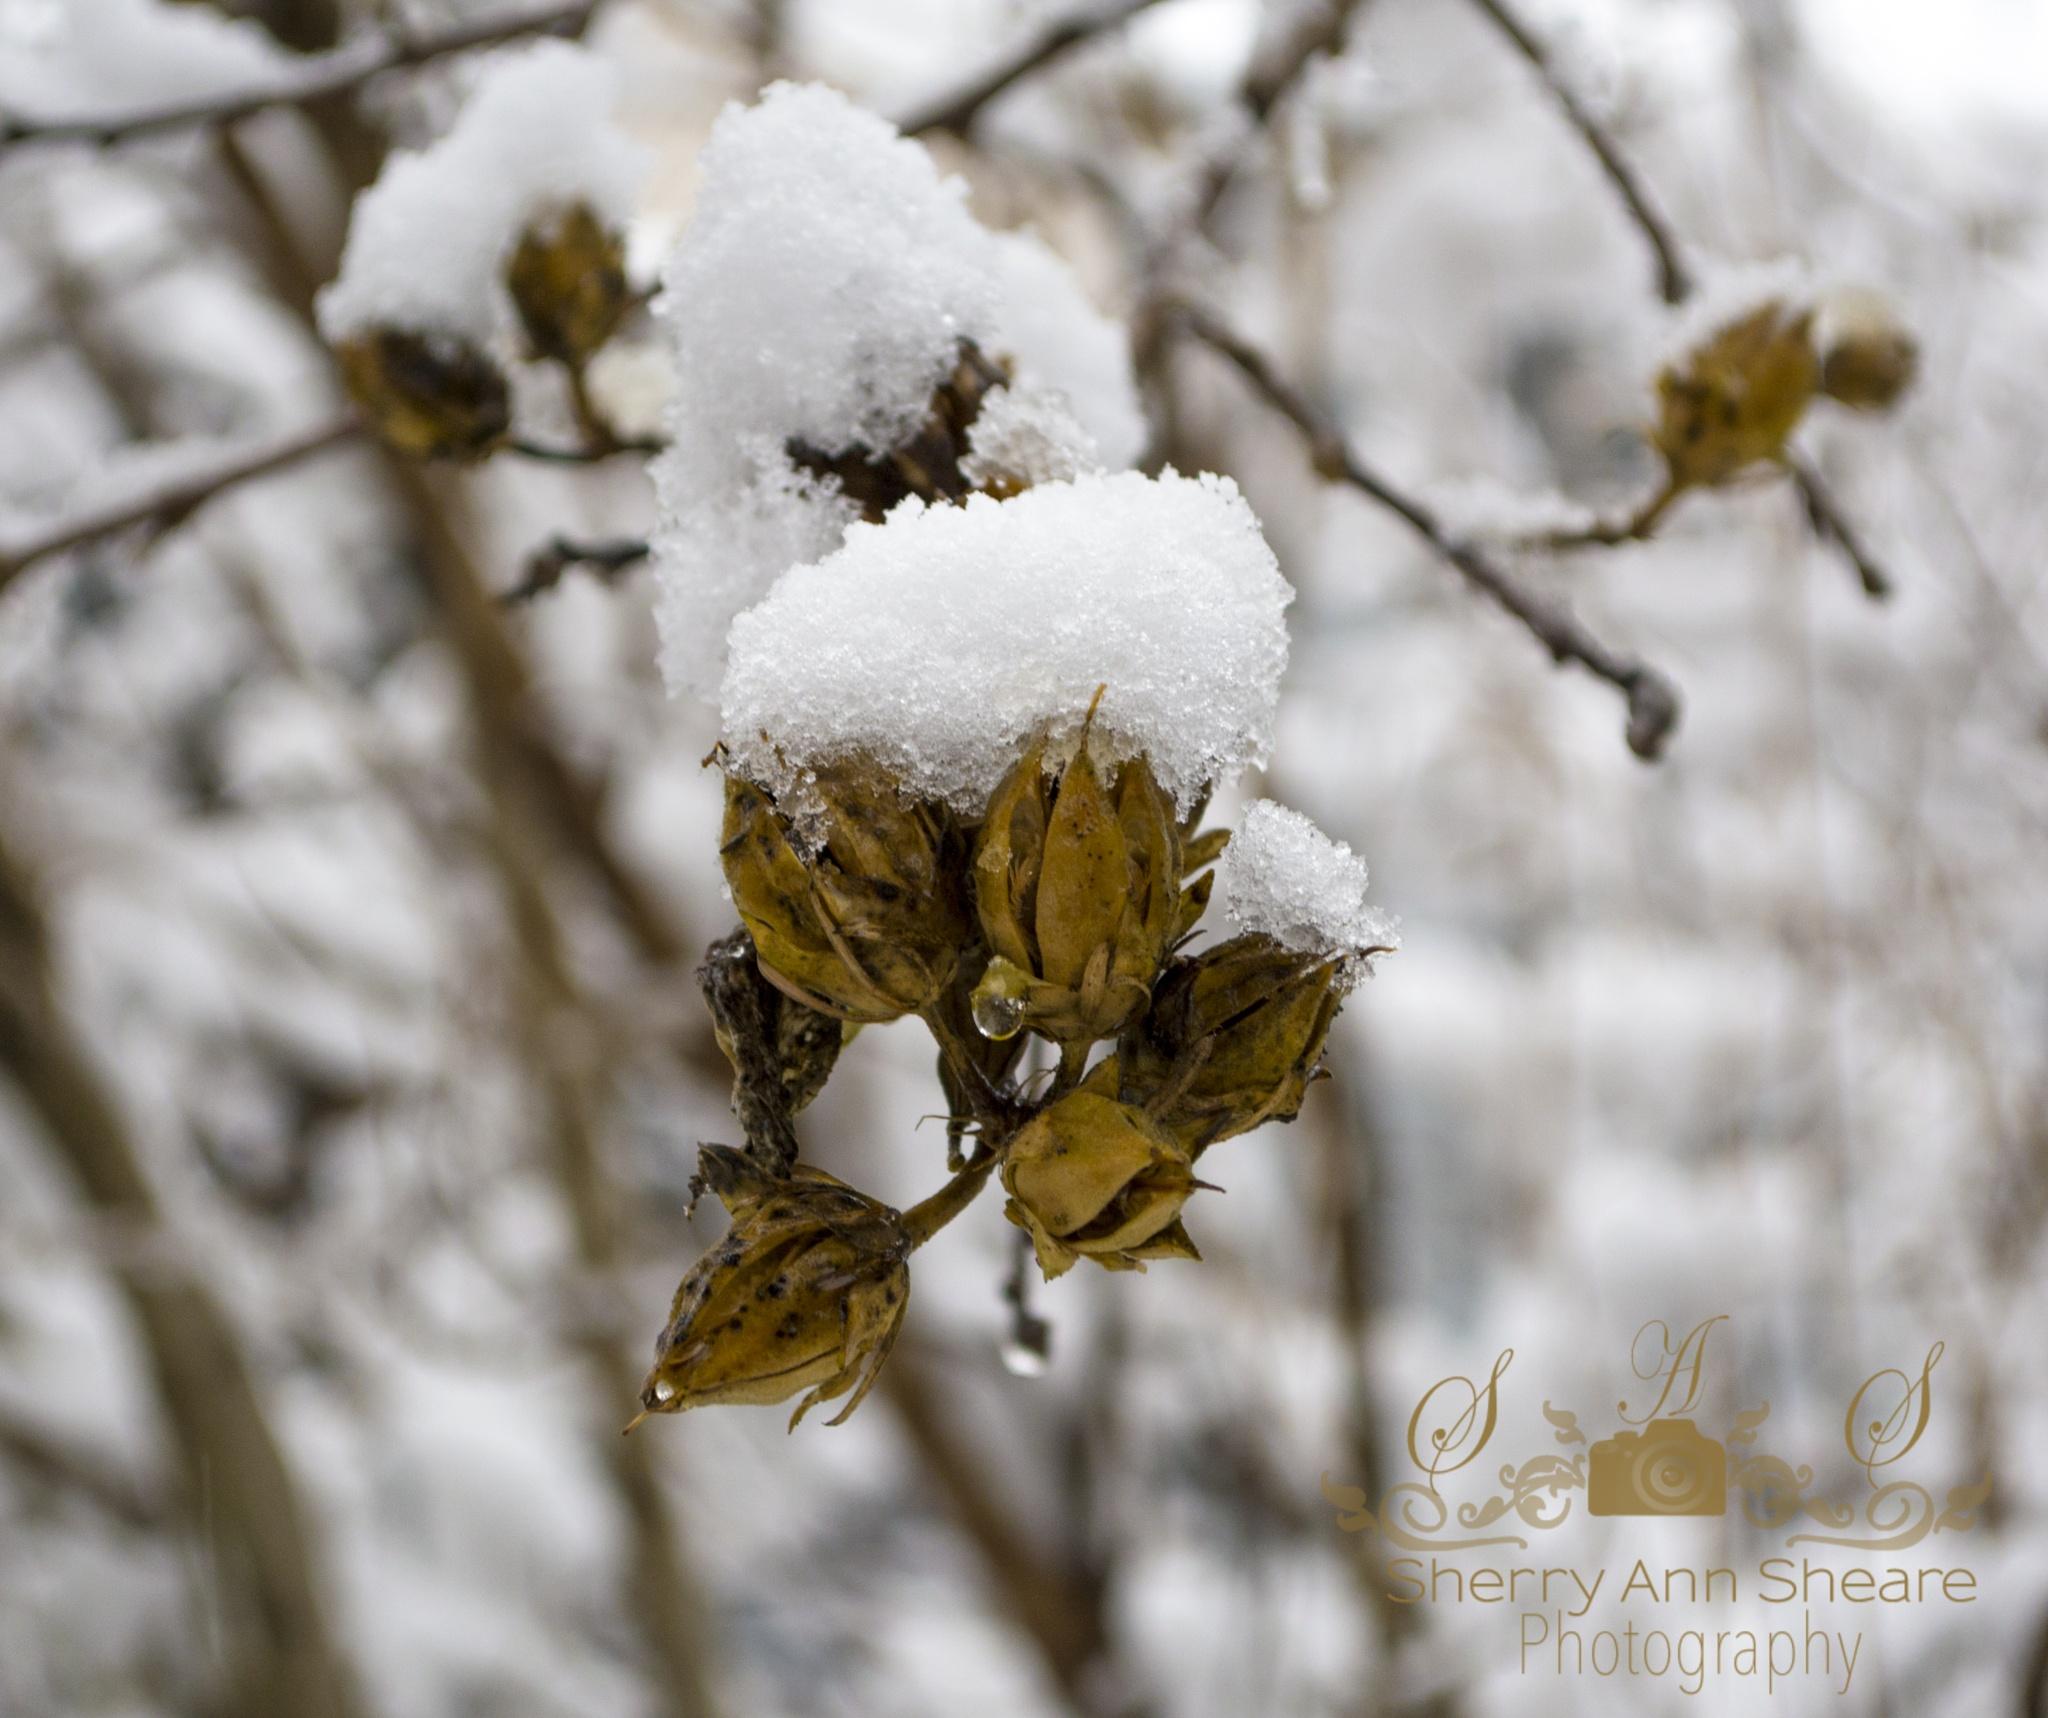 Snow by Sherry Ann Sheare